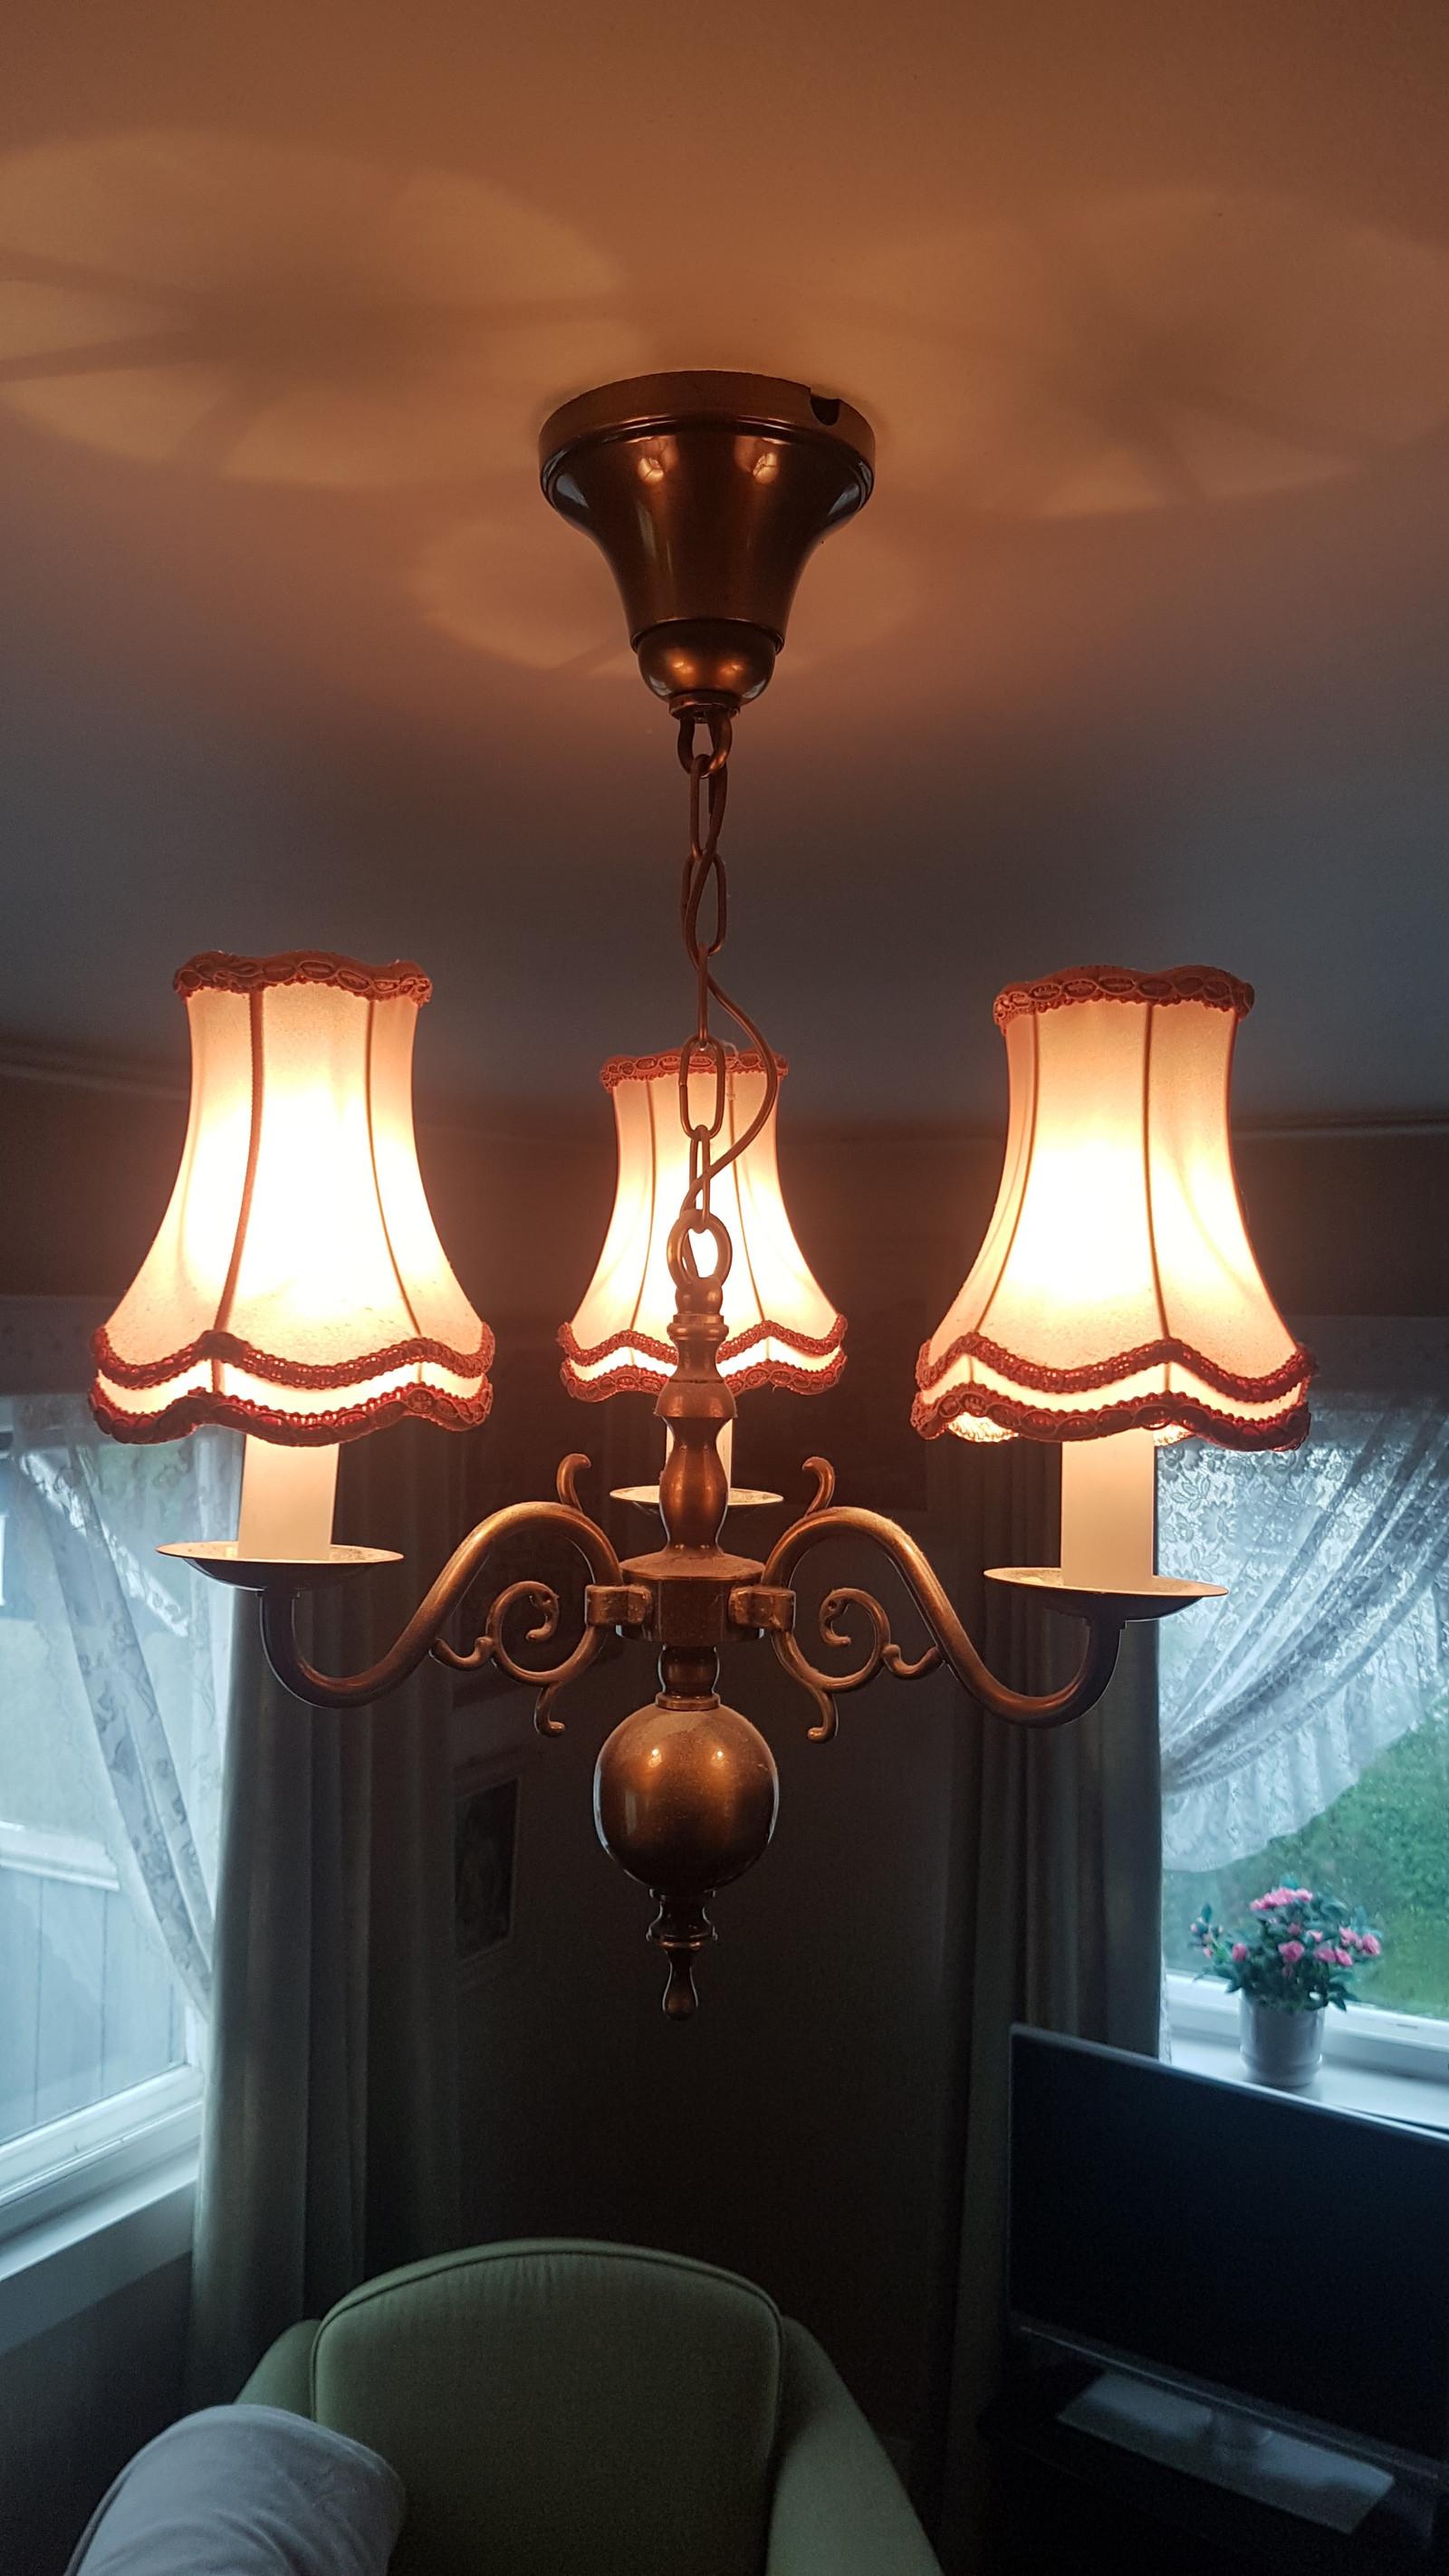 Oksydert messing tak lampe | FINN.no